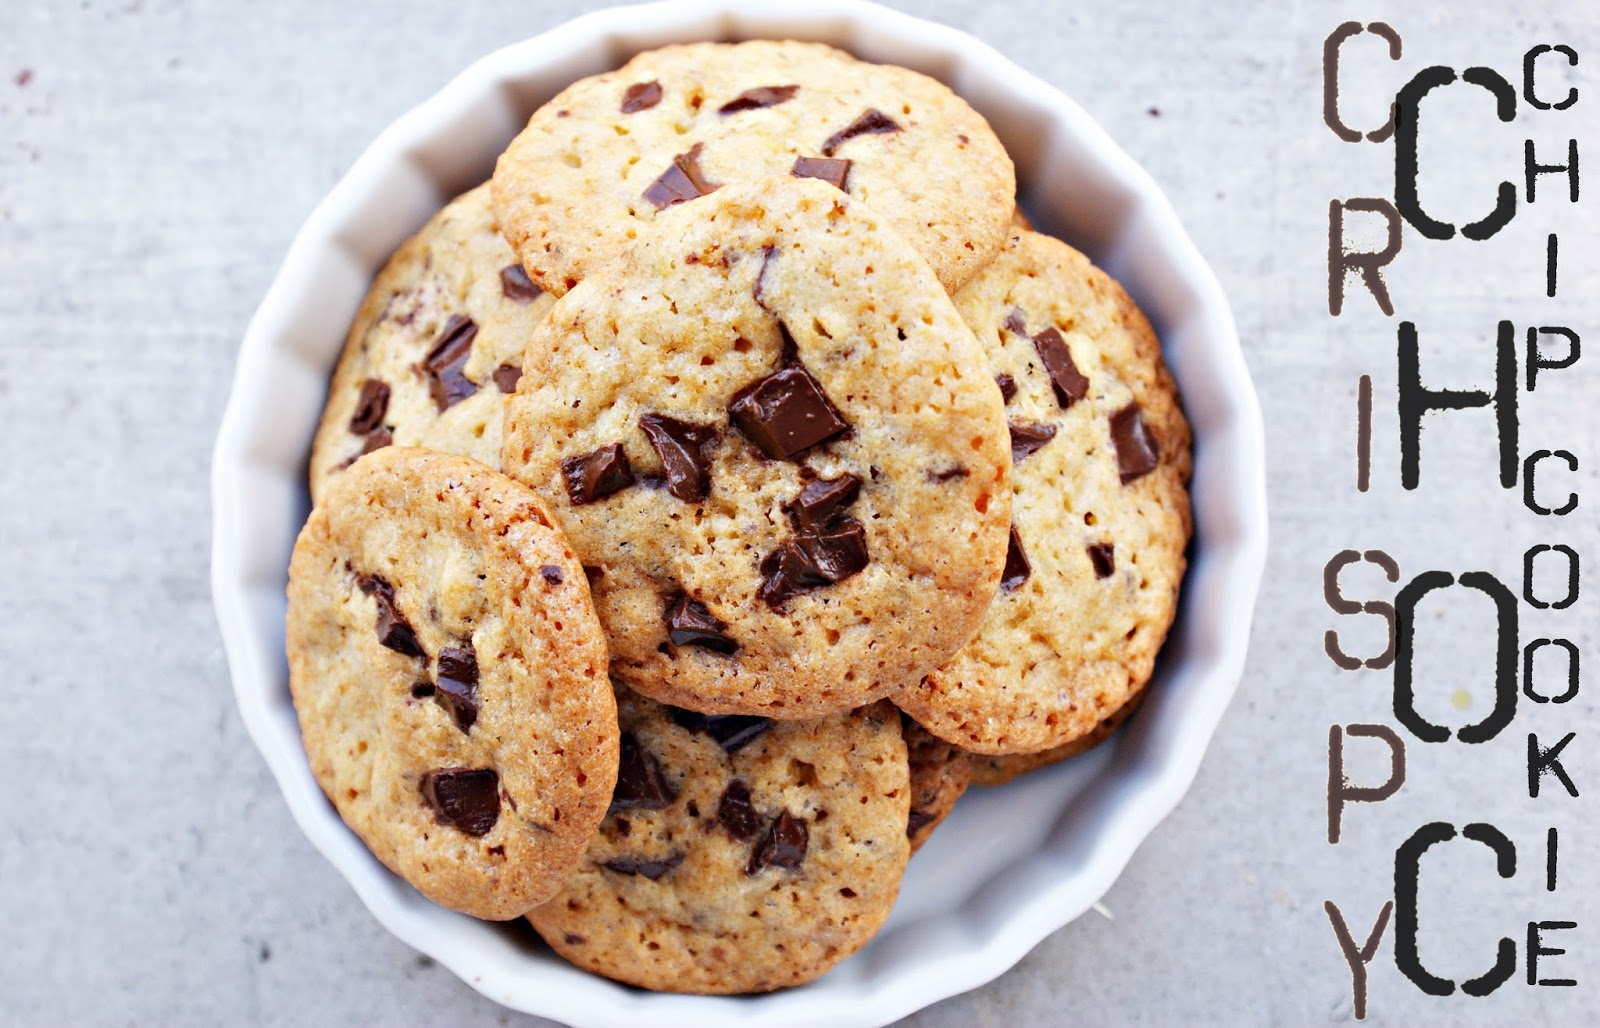 Kuchenkoma: Classic Crispy Chocolate Chip Cookie